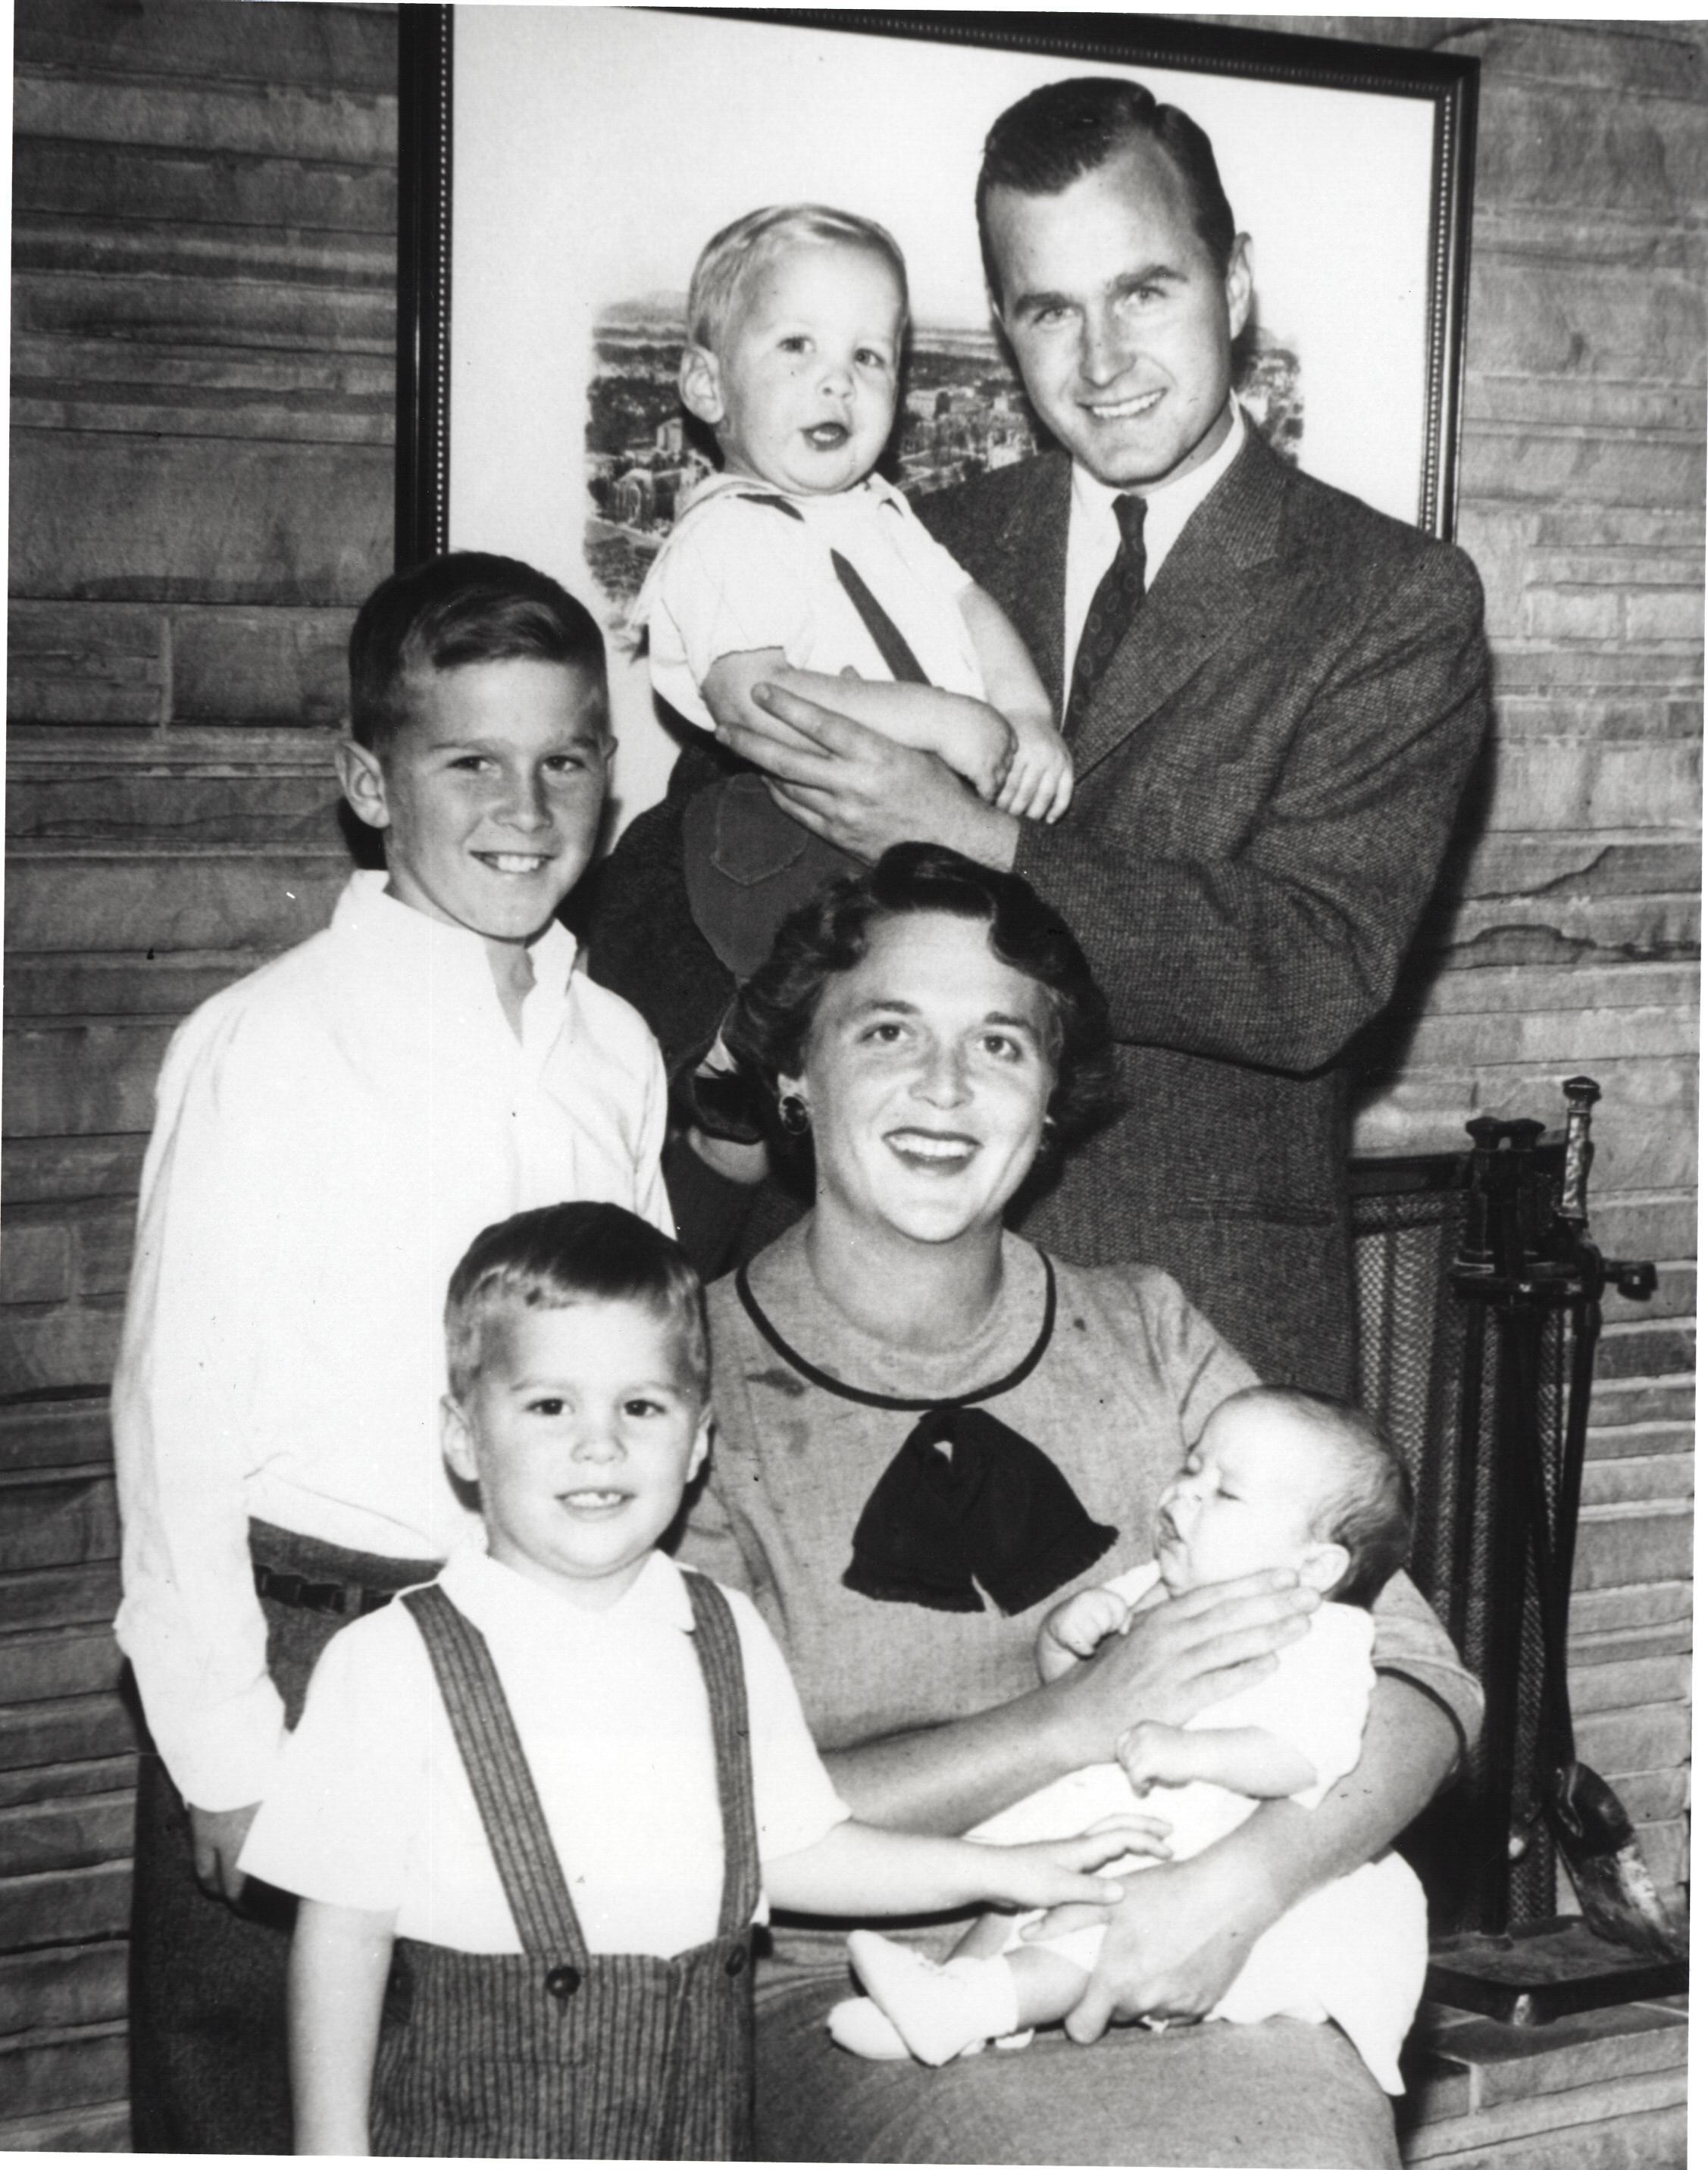 George H.W. Bush, Barbara bush, and their family